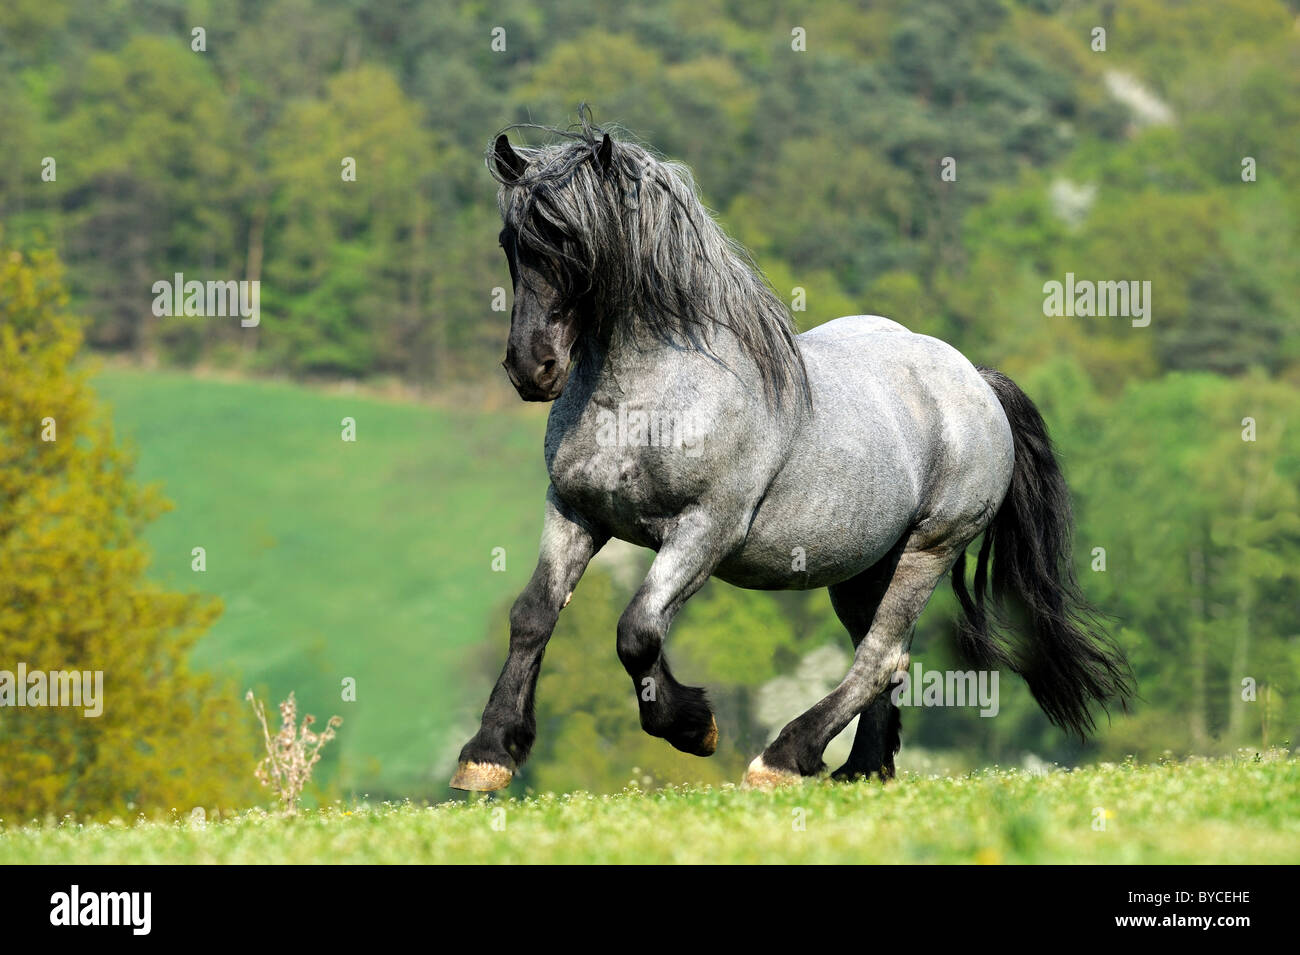 Noriker Horse (Equus ferus caballus), stallion in a gallop on a pasture. - Stock Image